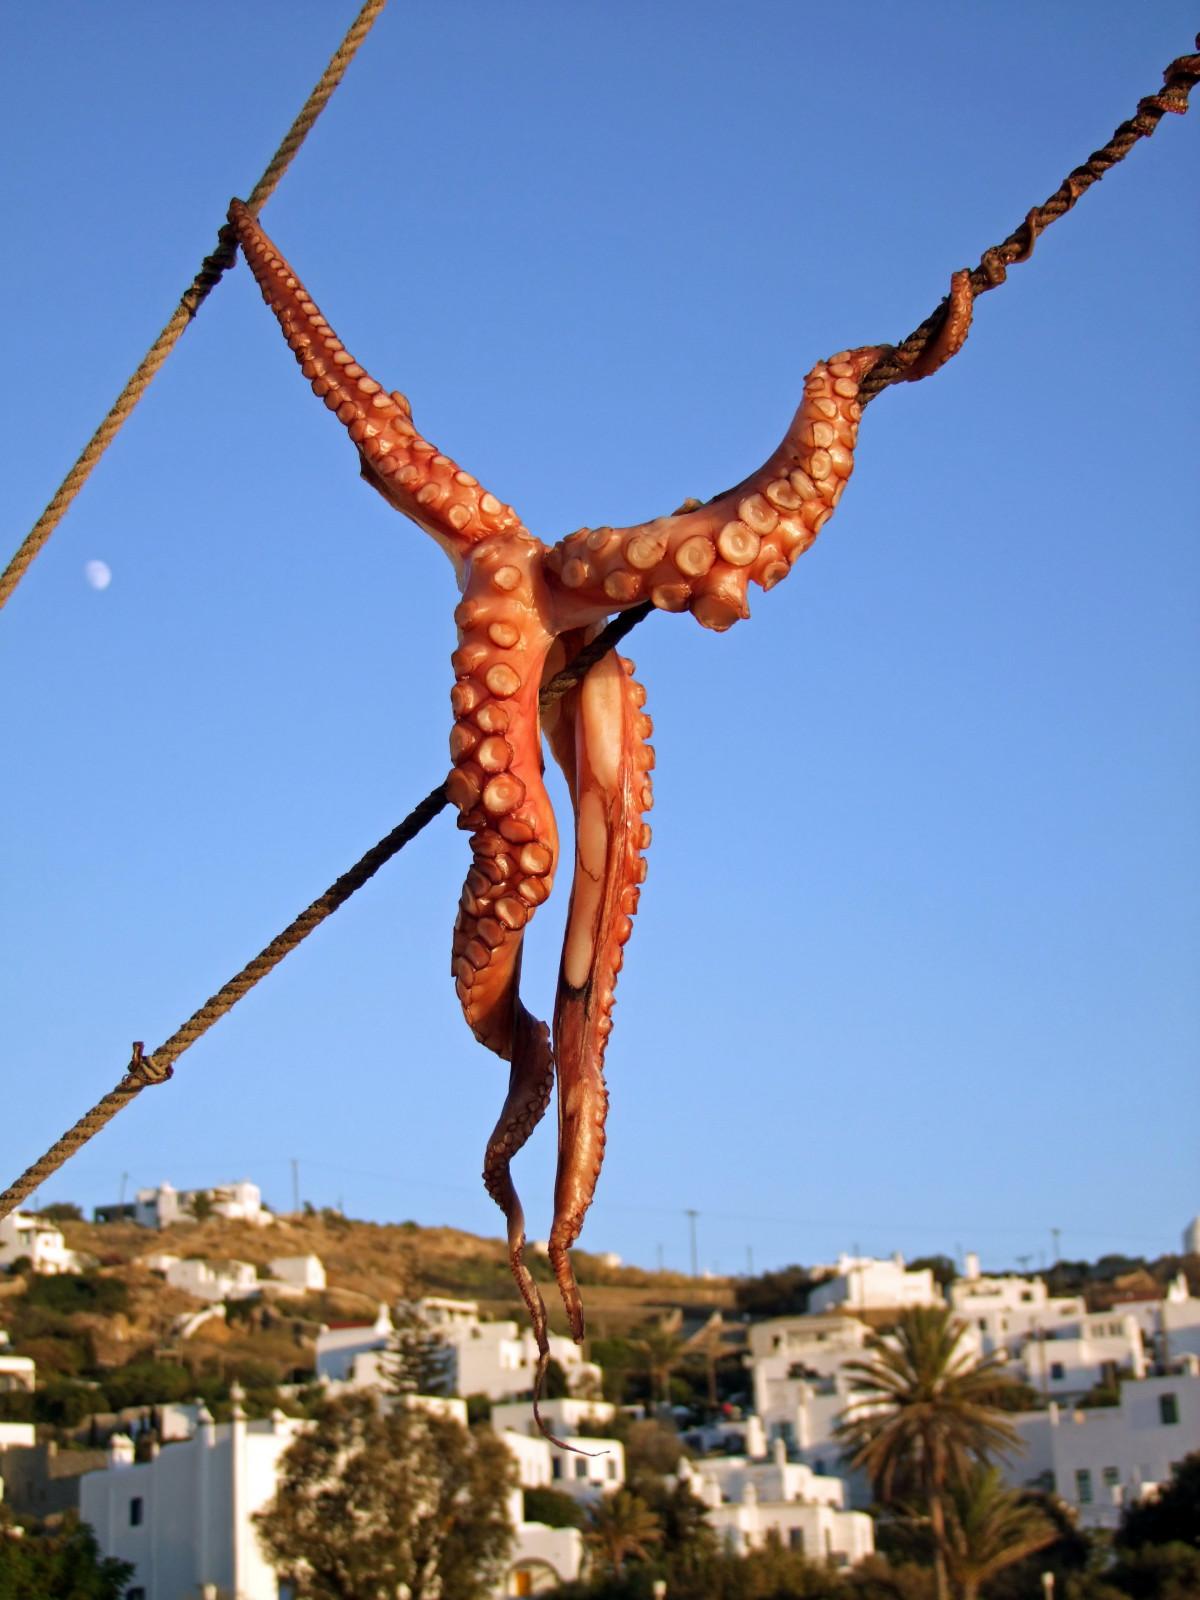 Free Images Tree Monument Dry Statue Fish Squid Octopus